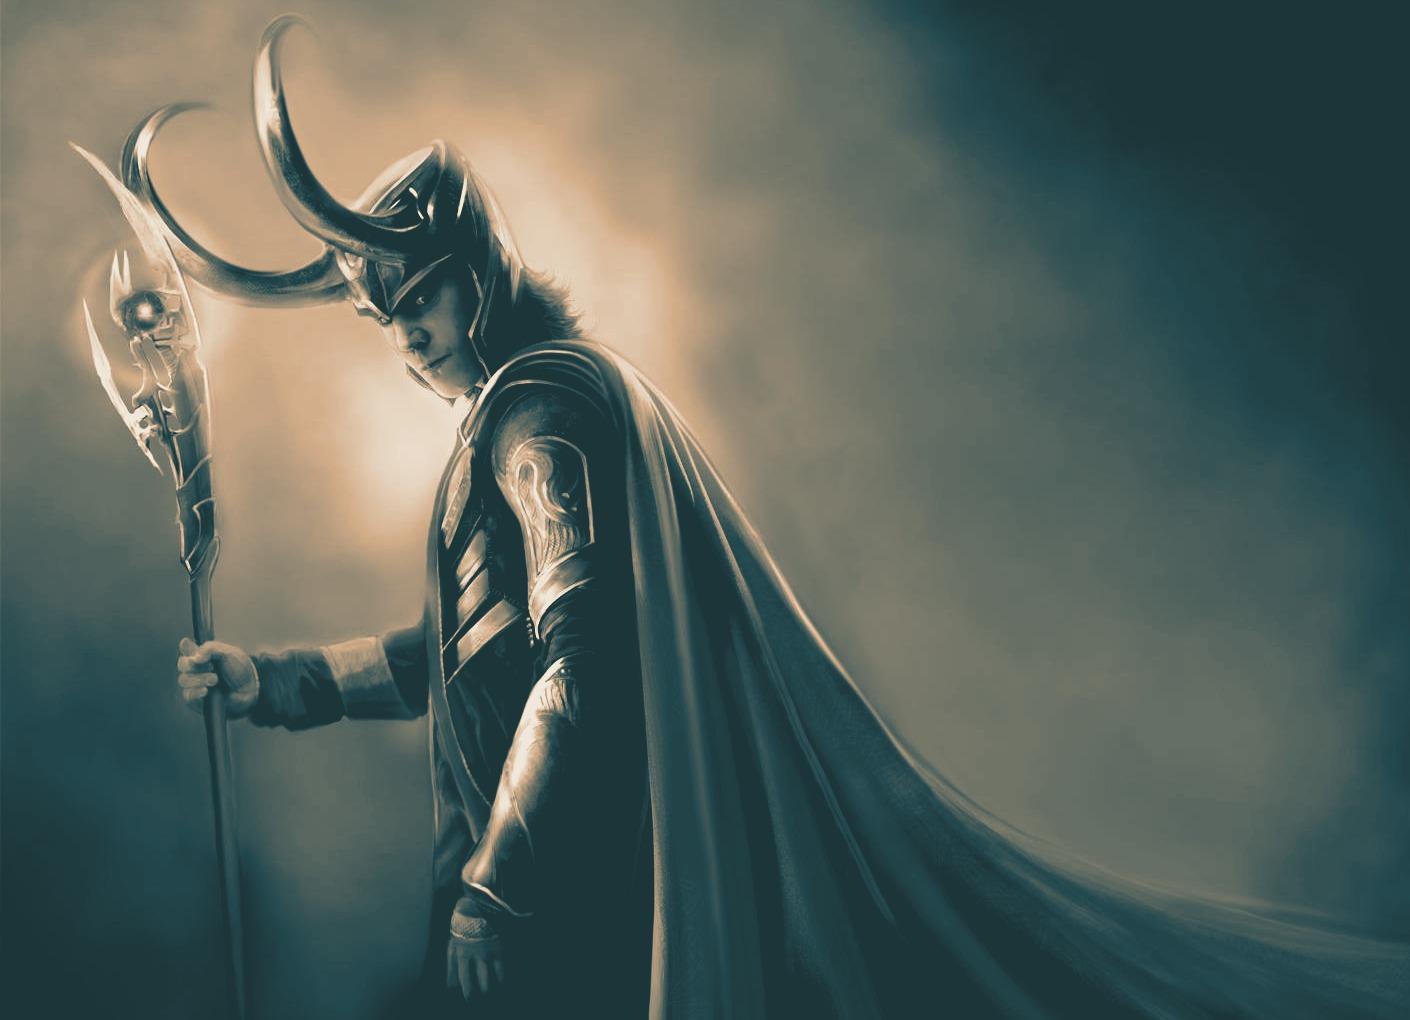 Loki 1.8 досье на молодой и подающий надежды Data Stealer